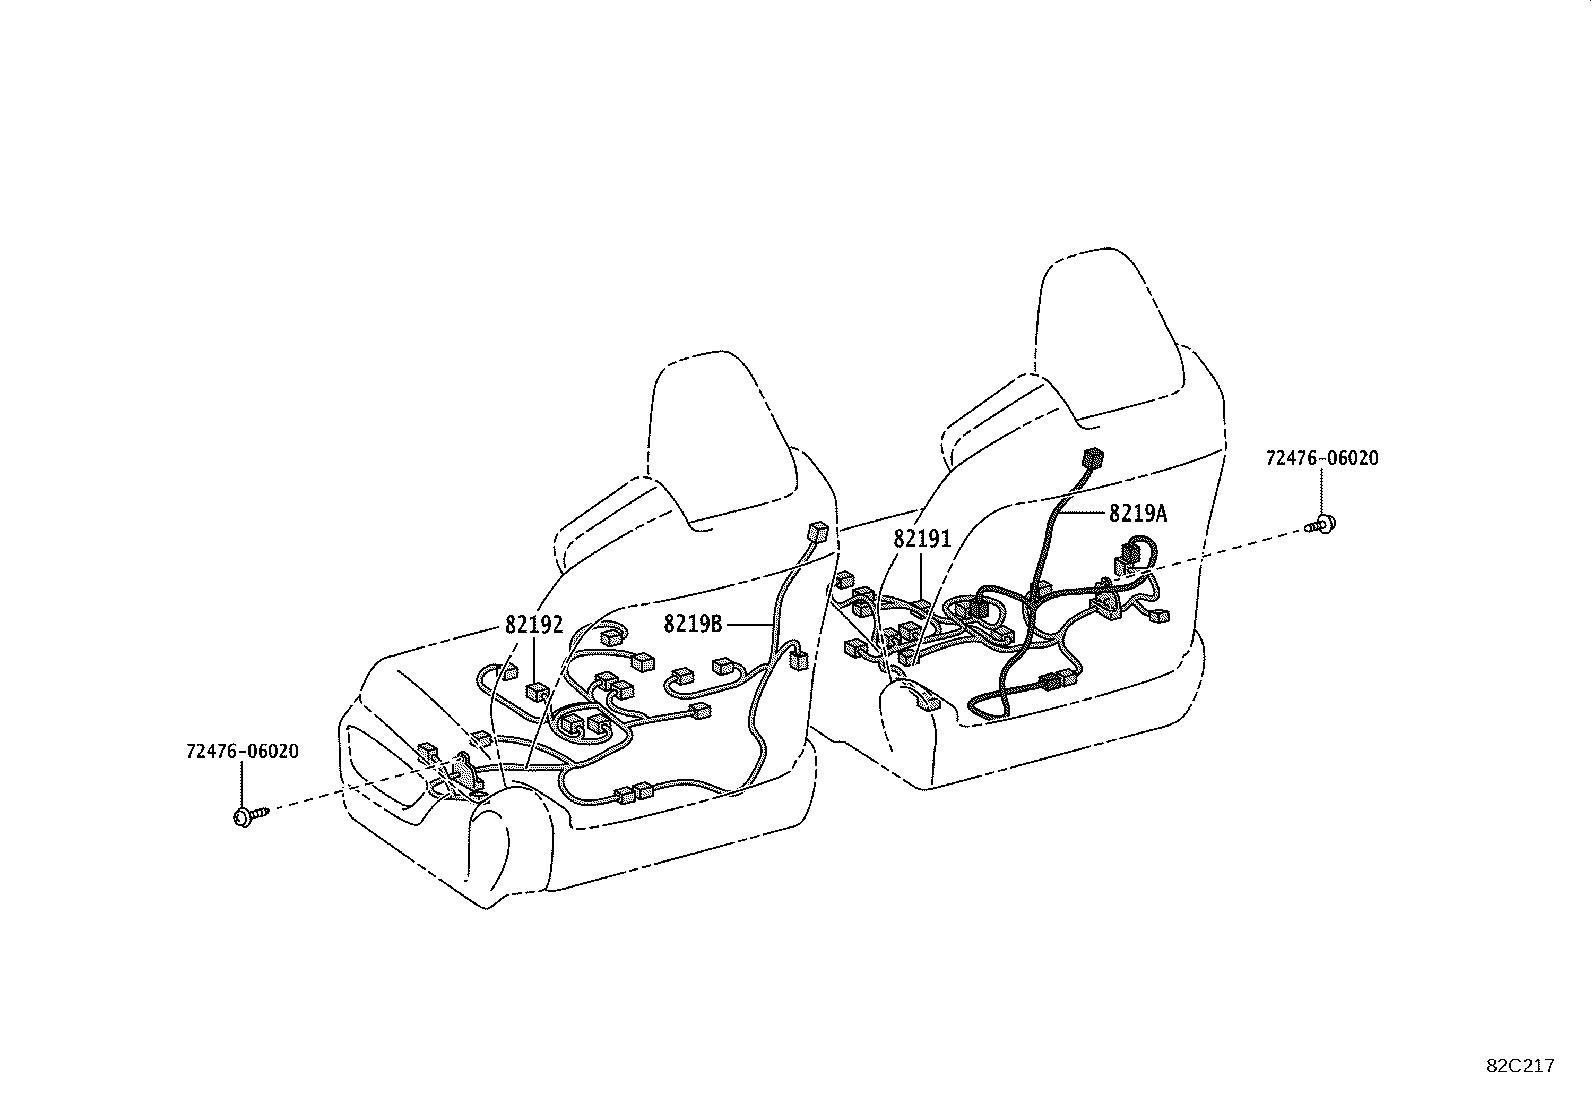 Lexus Es 350 Protector Wiring Harness No 3 Wiring